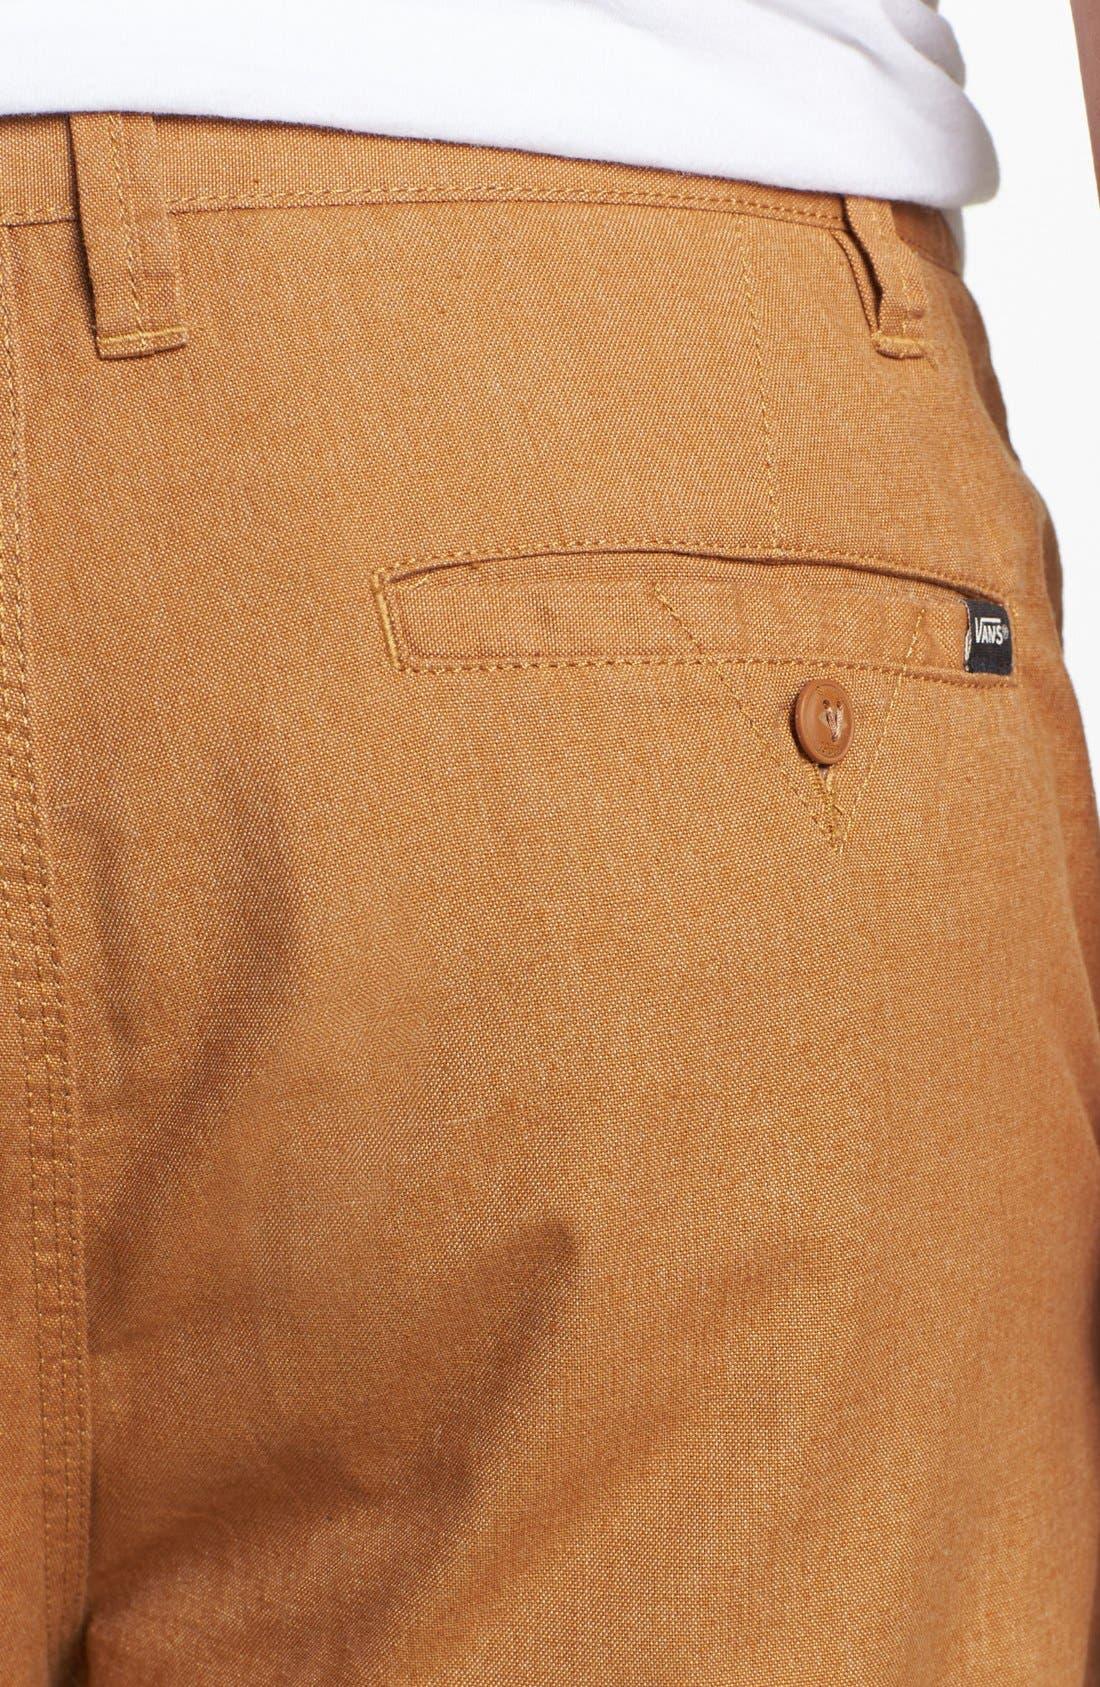 Alternate Image 3  - Vans 'Dewitt' Shorts